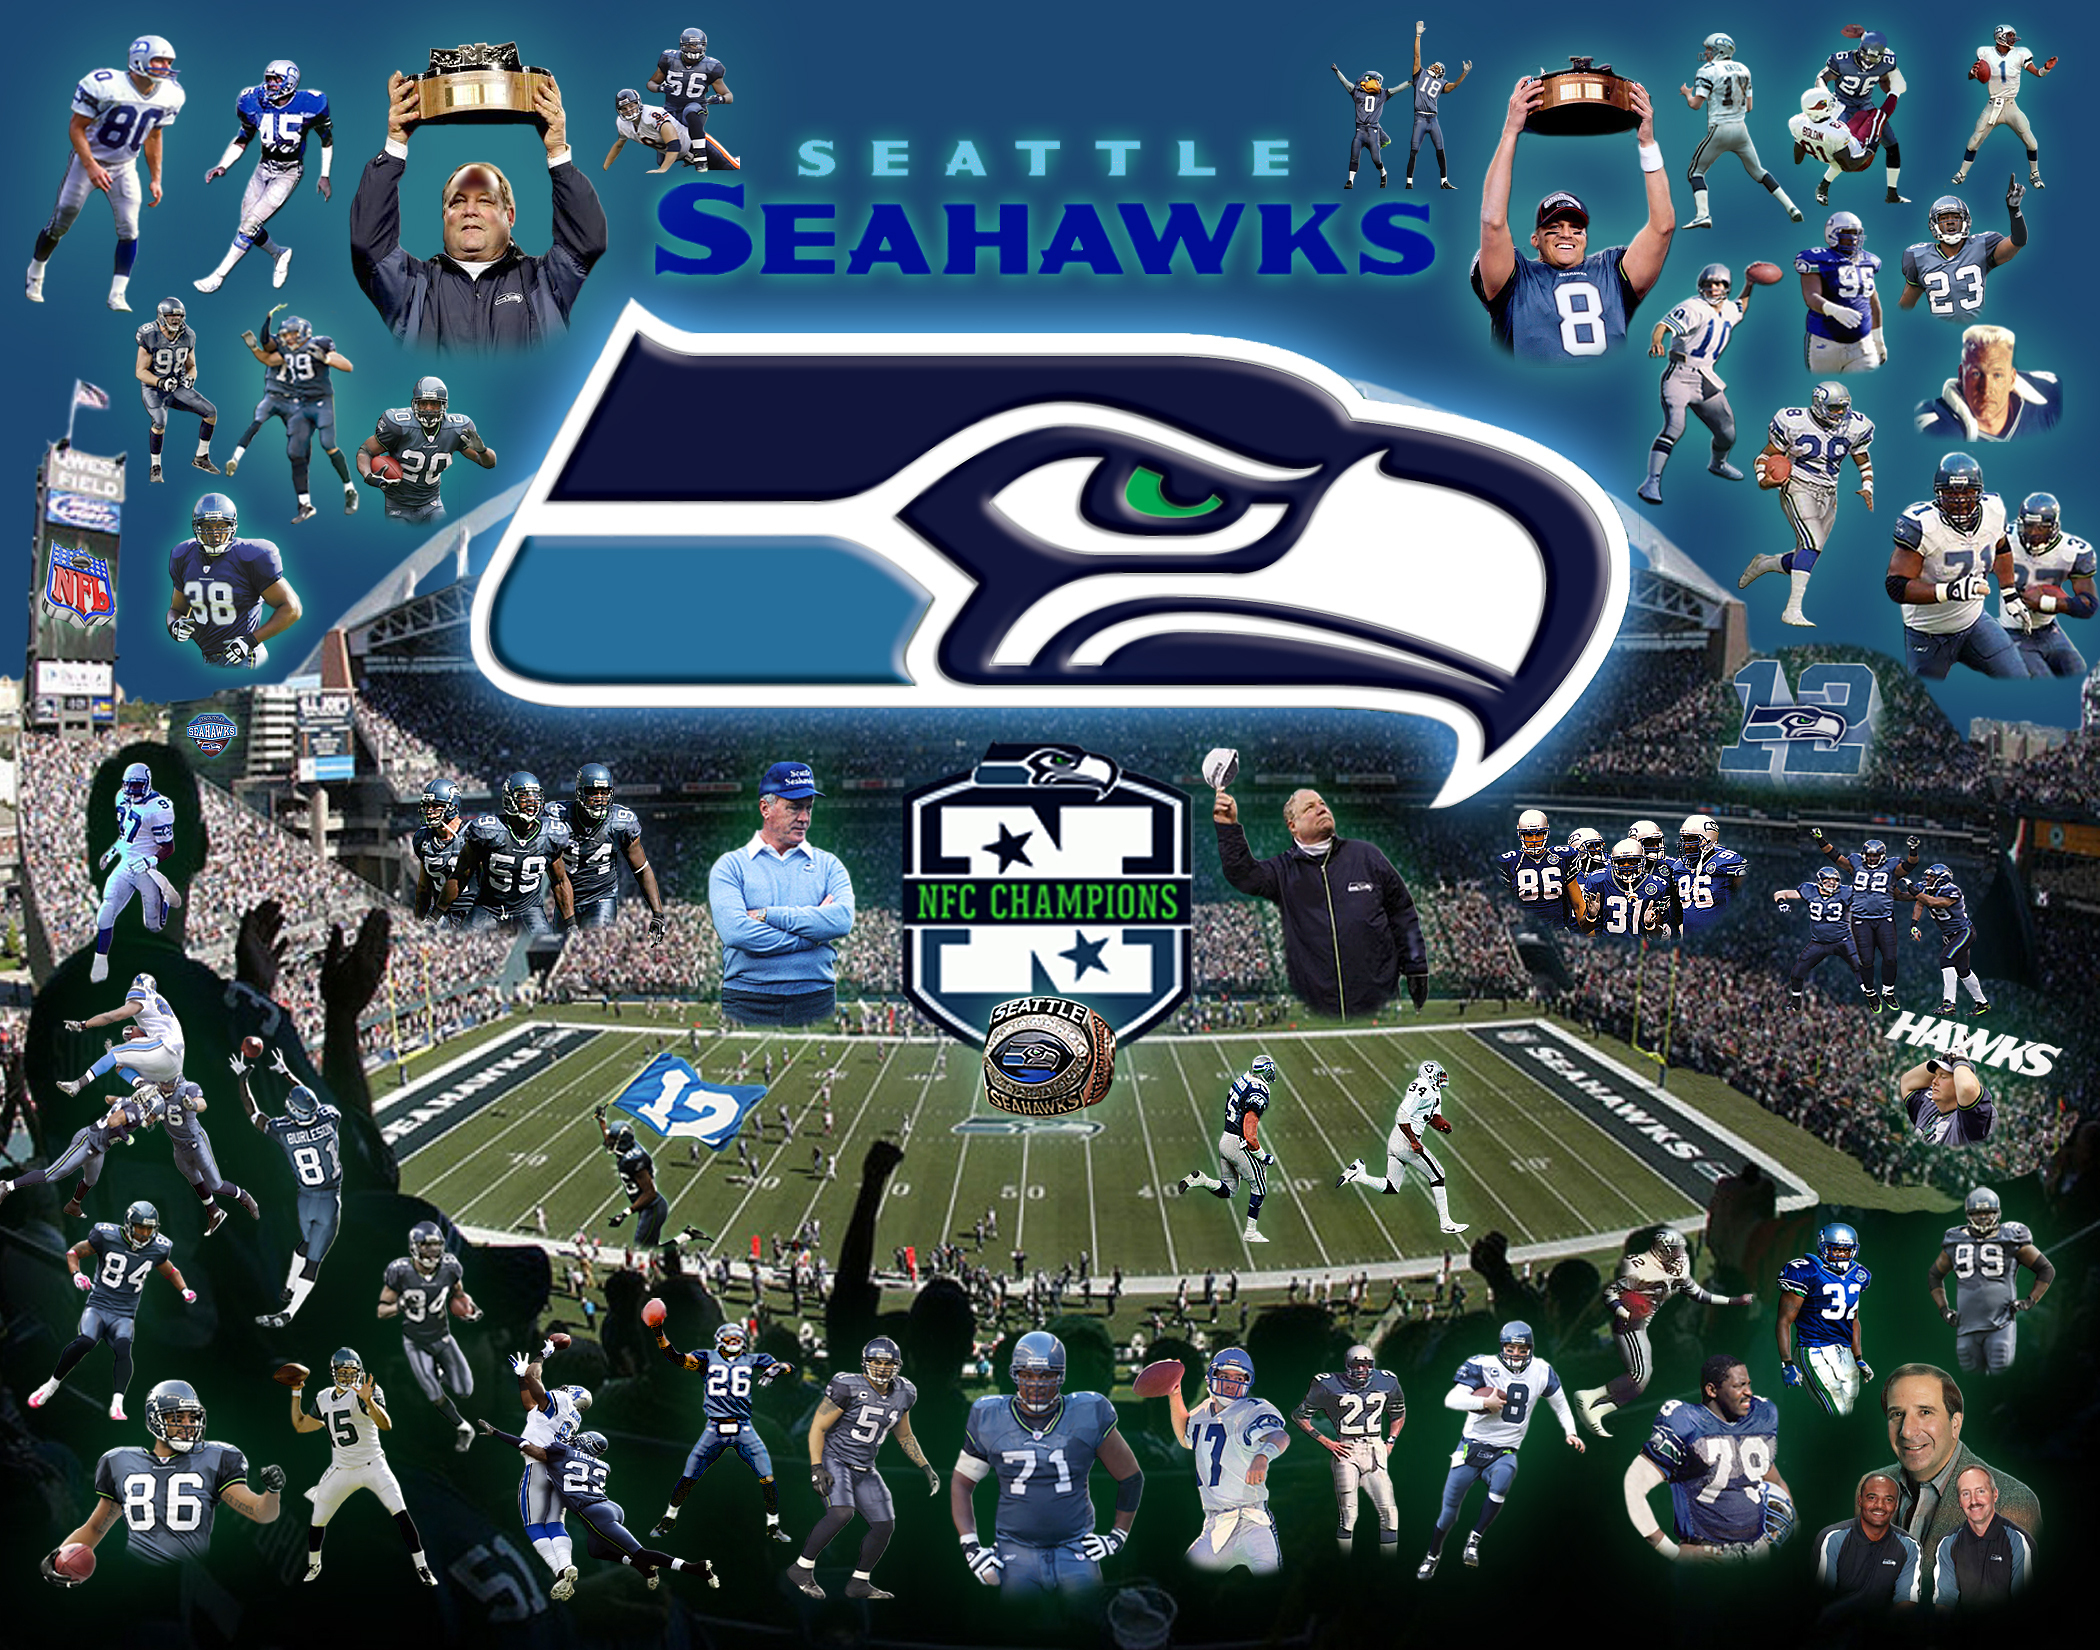 Seahawks Pics & Wallpaper